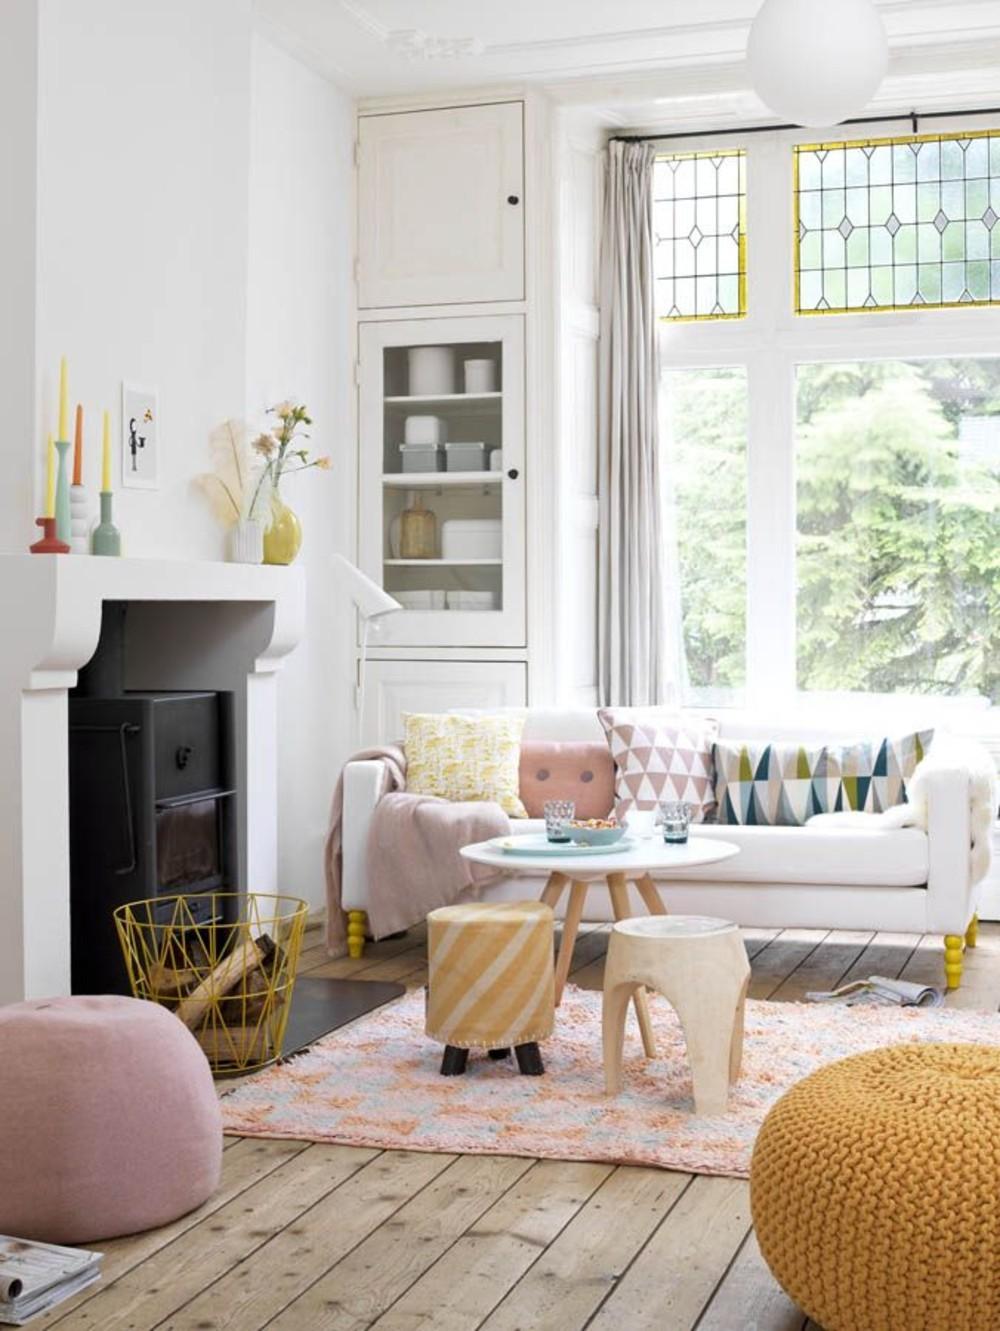 vrolijk interieur vrolijk interieur interieurstijlen